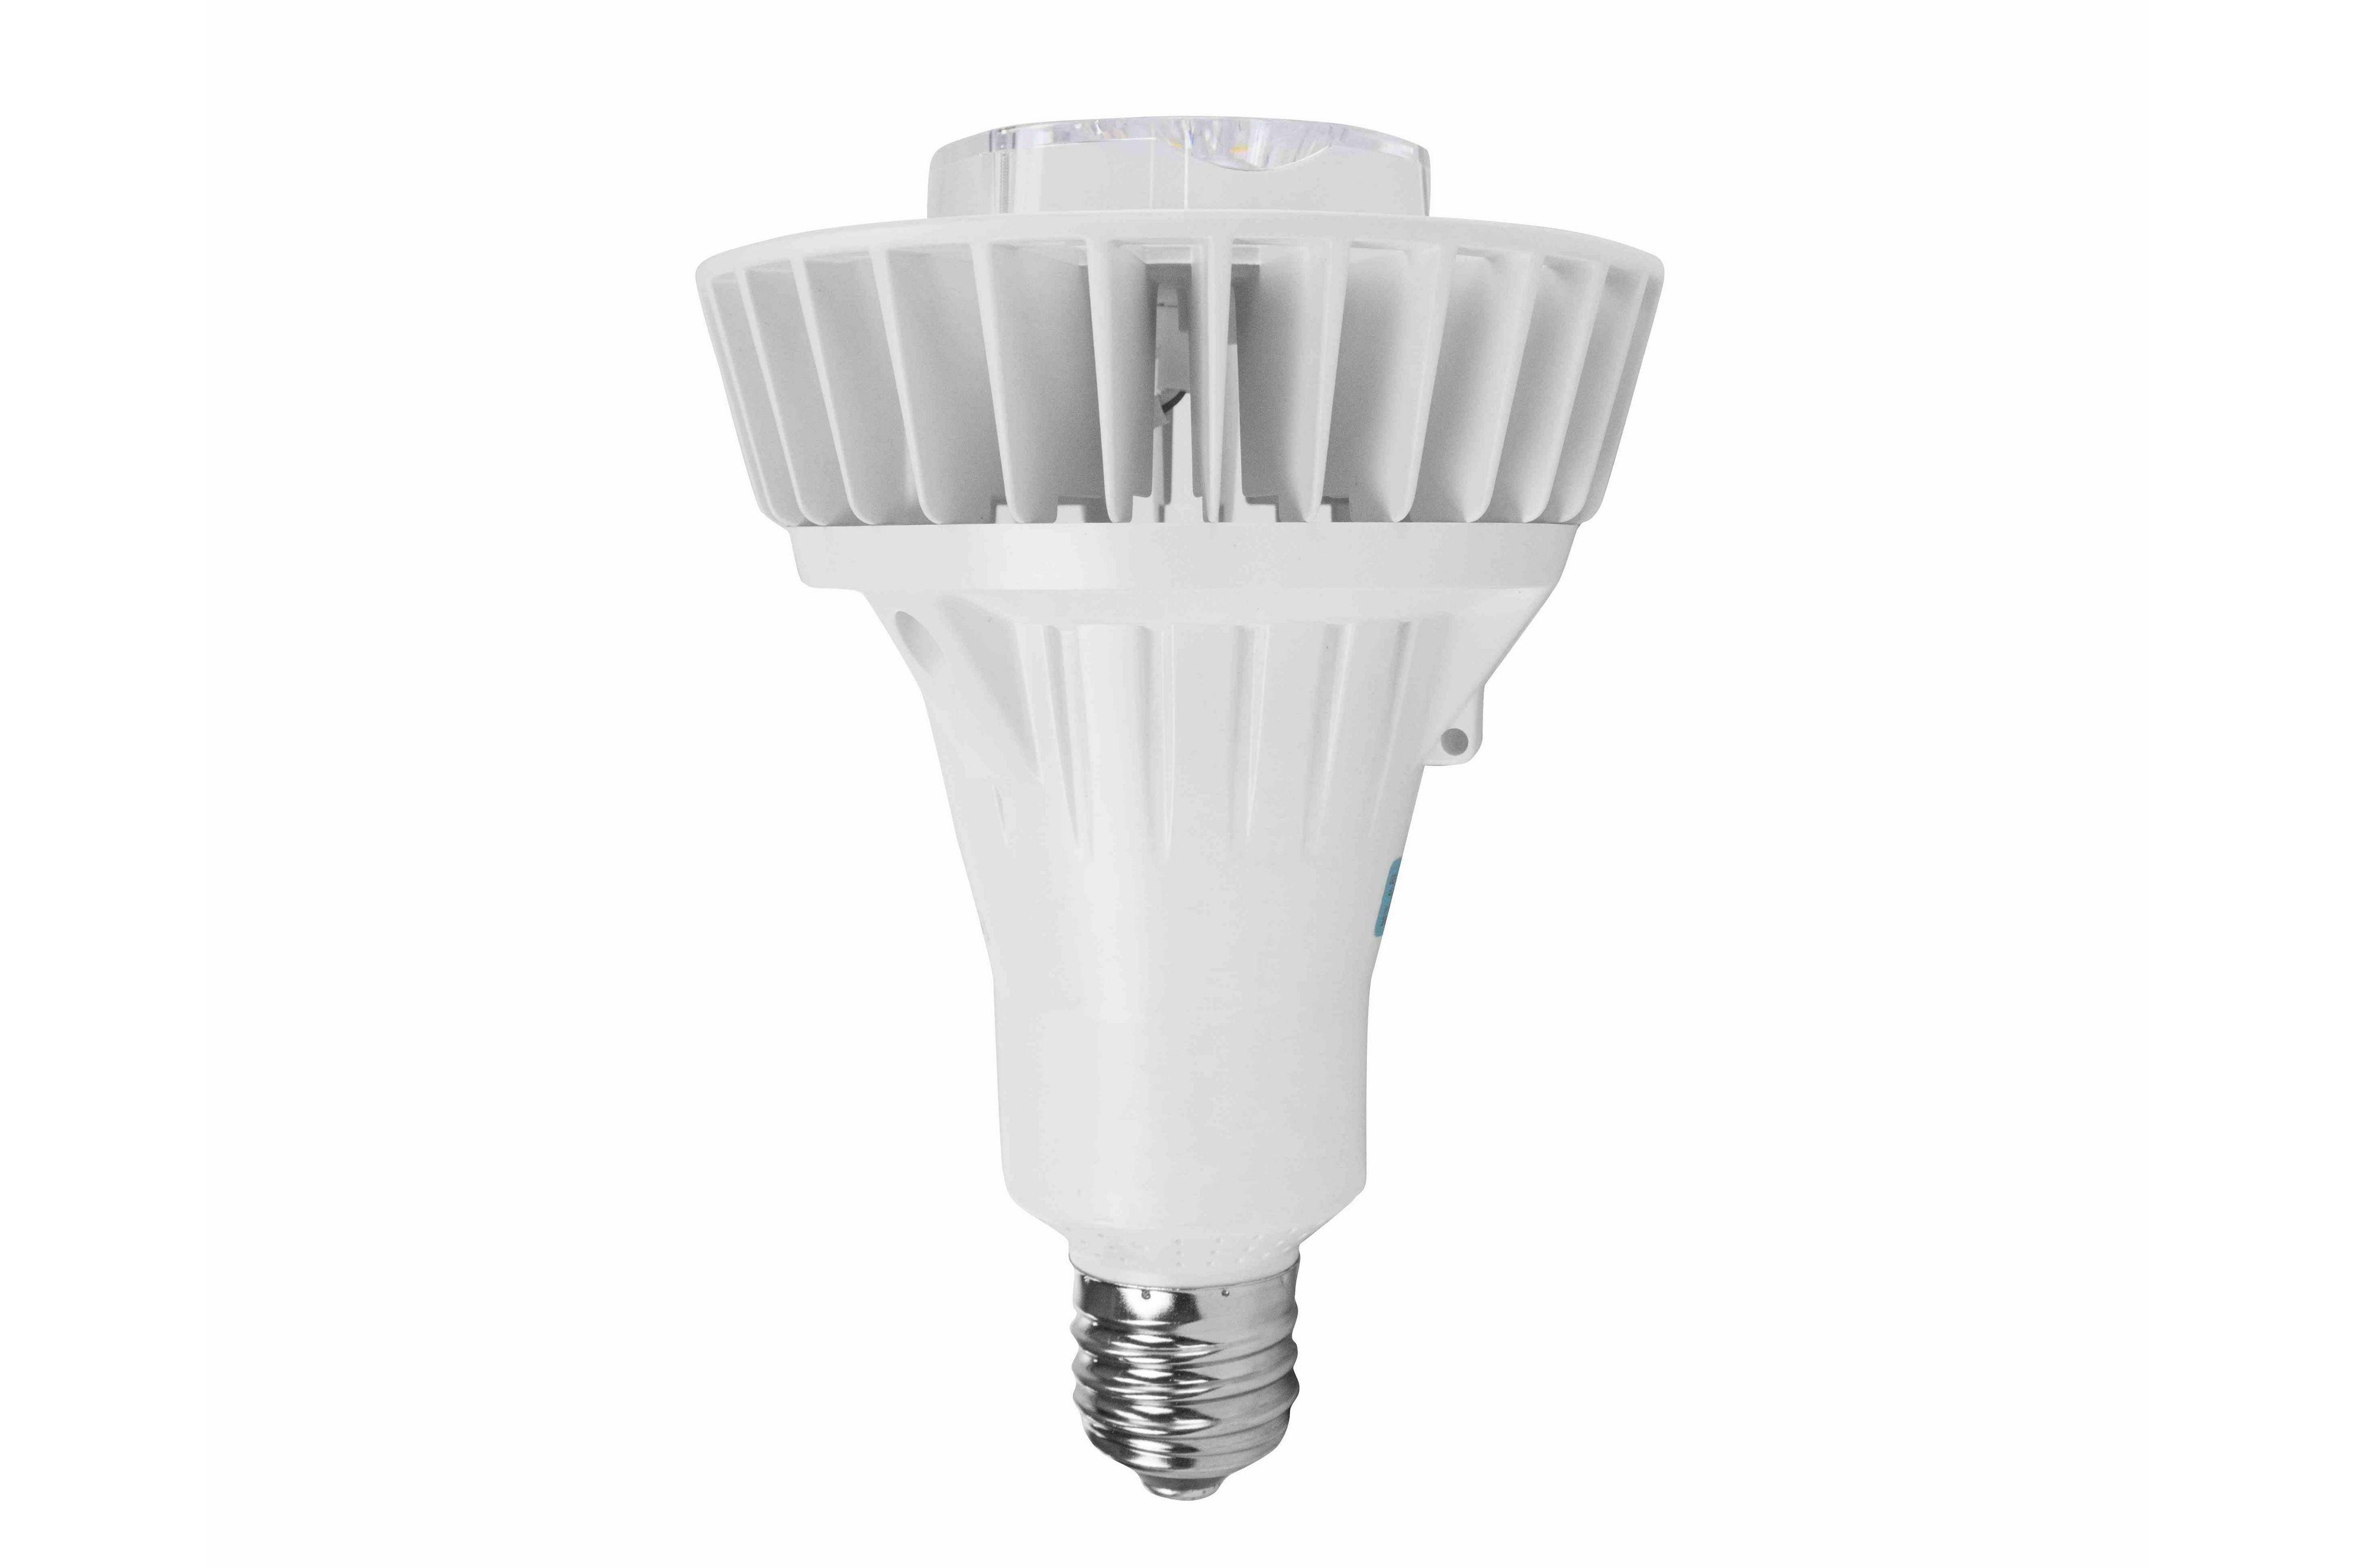 Led Replacement Headlight Bulbs >> 43 Watt BT56 LED Lamp - 4,200 Lumens - E39 Screw Base